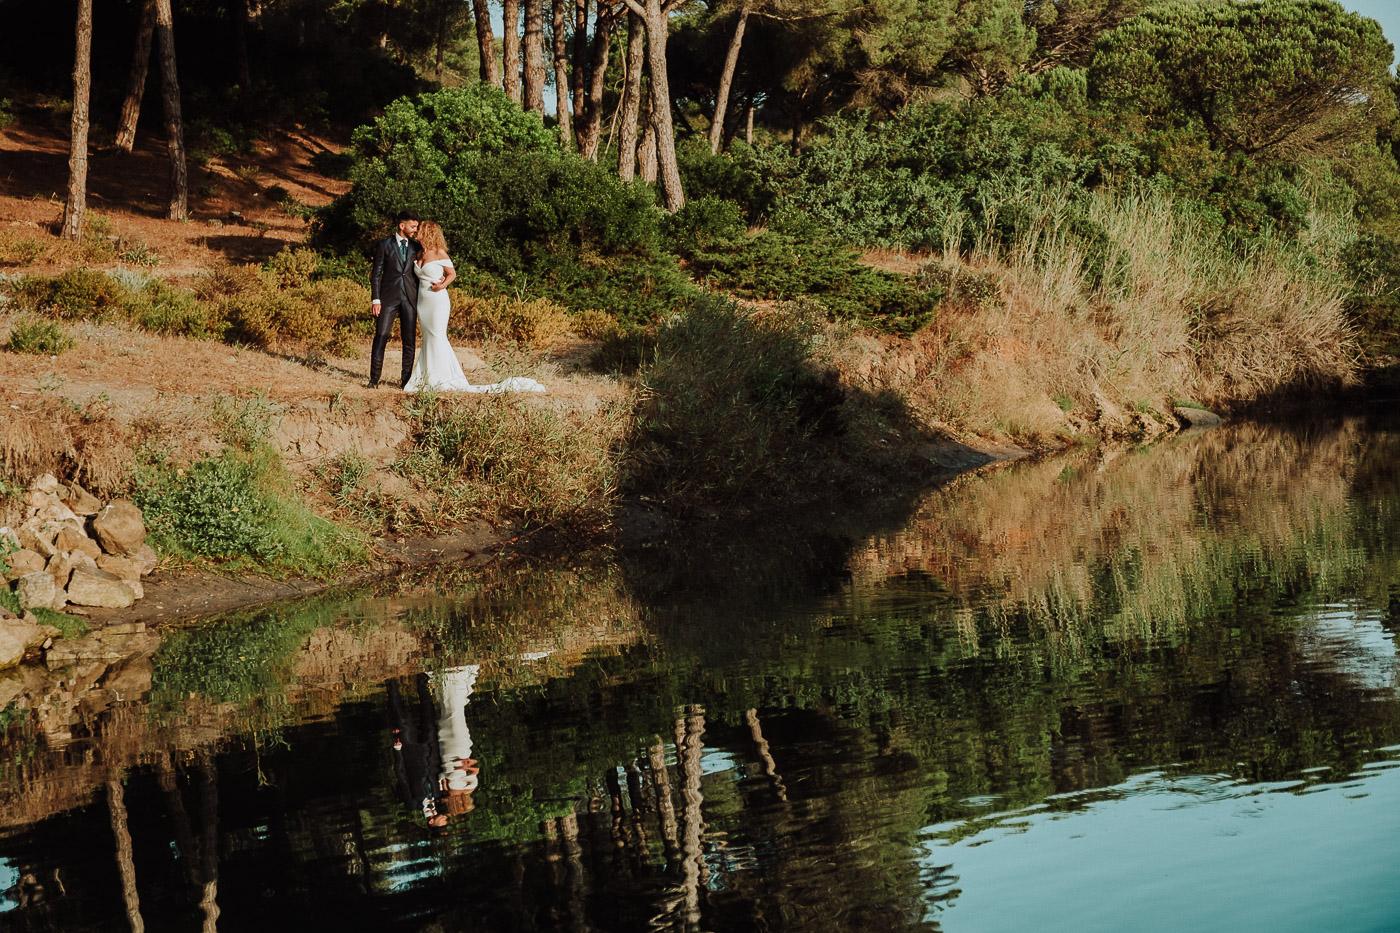 fotografo-bodas-cadiz-preboda-Roche-manuel-fijo